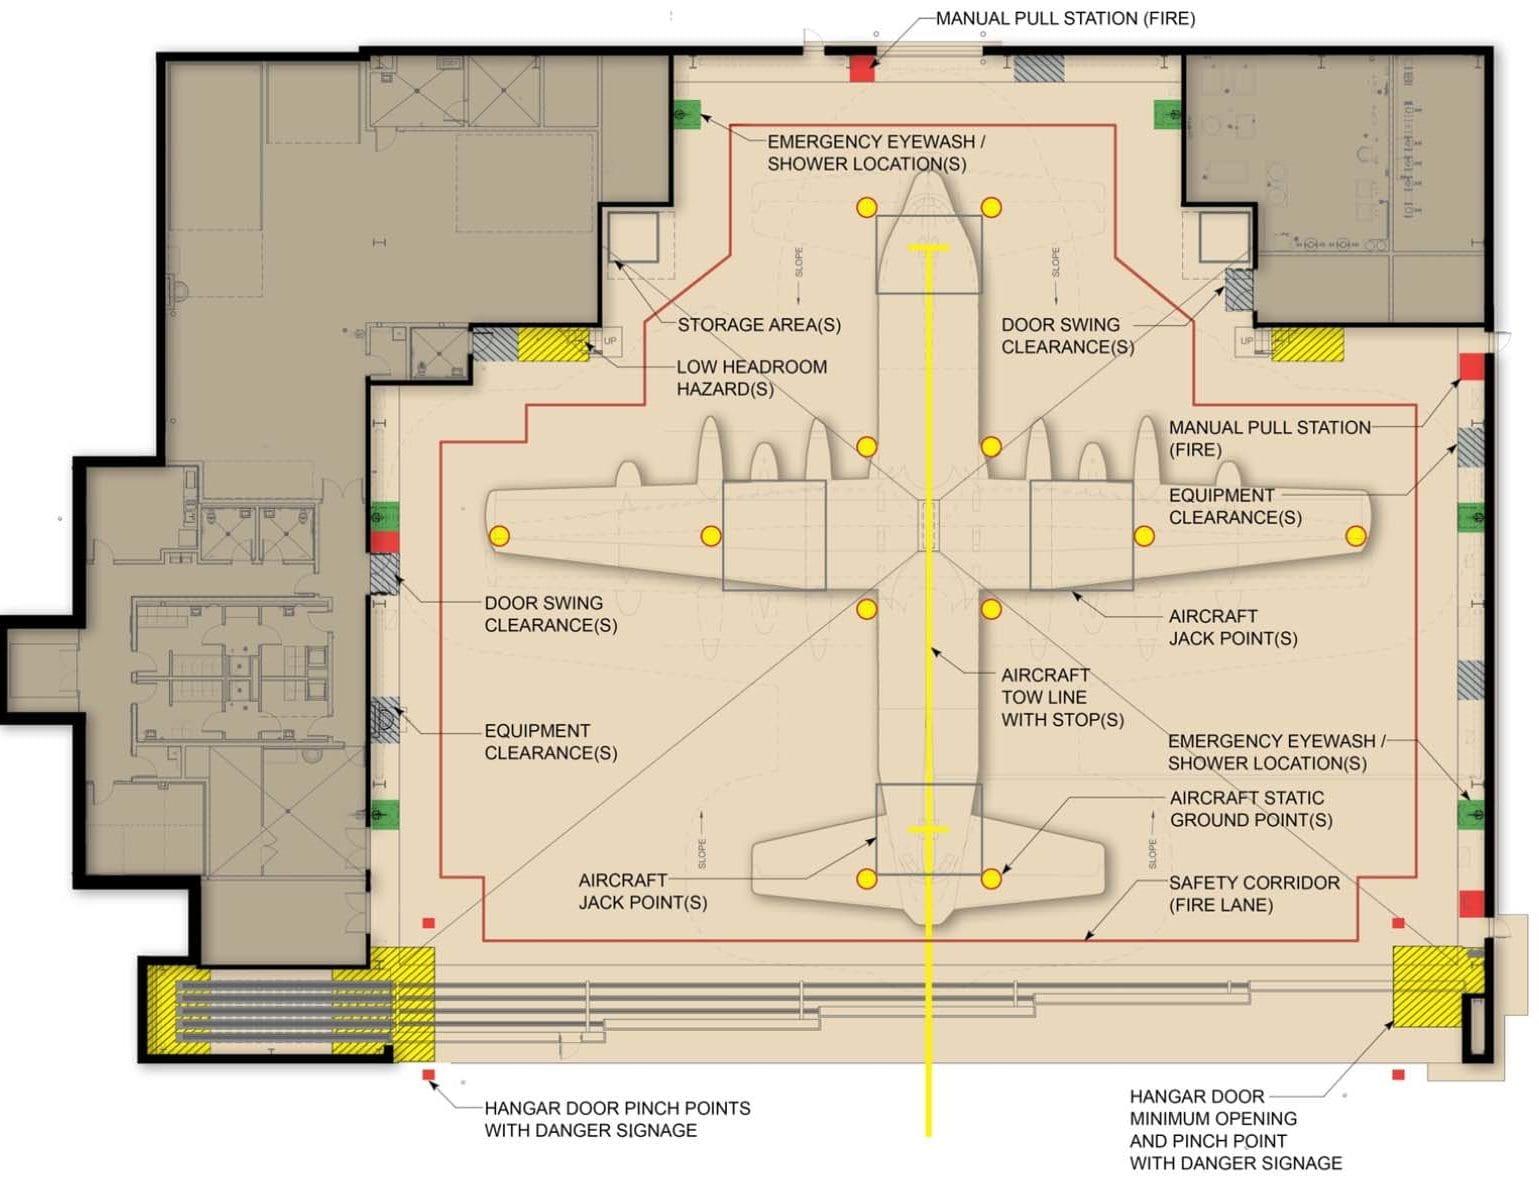 Aircraft Maintenance Hangars Floor Markings For Function